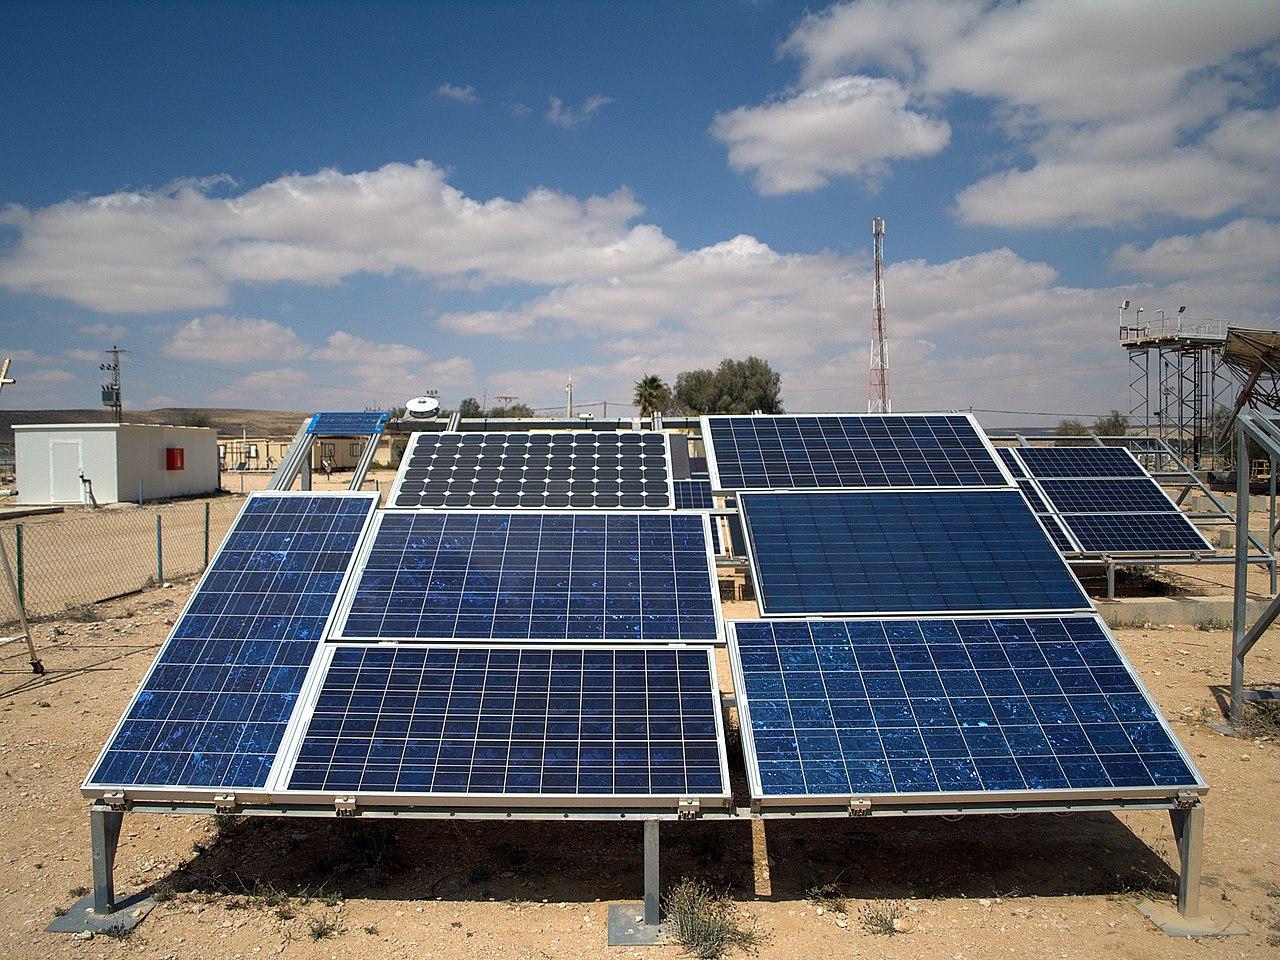 File:Photovoltaic arrays at the Israeli National Solar Energy Center.jpg